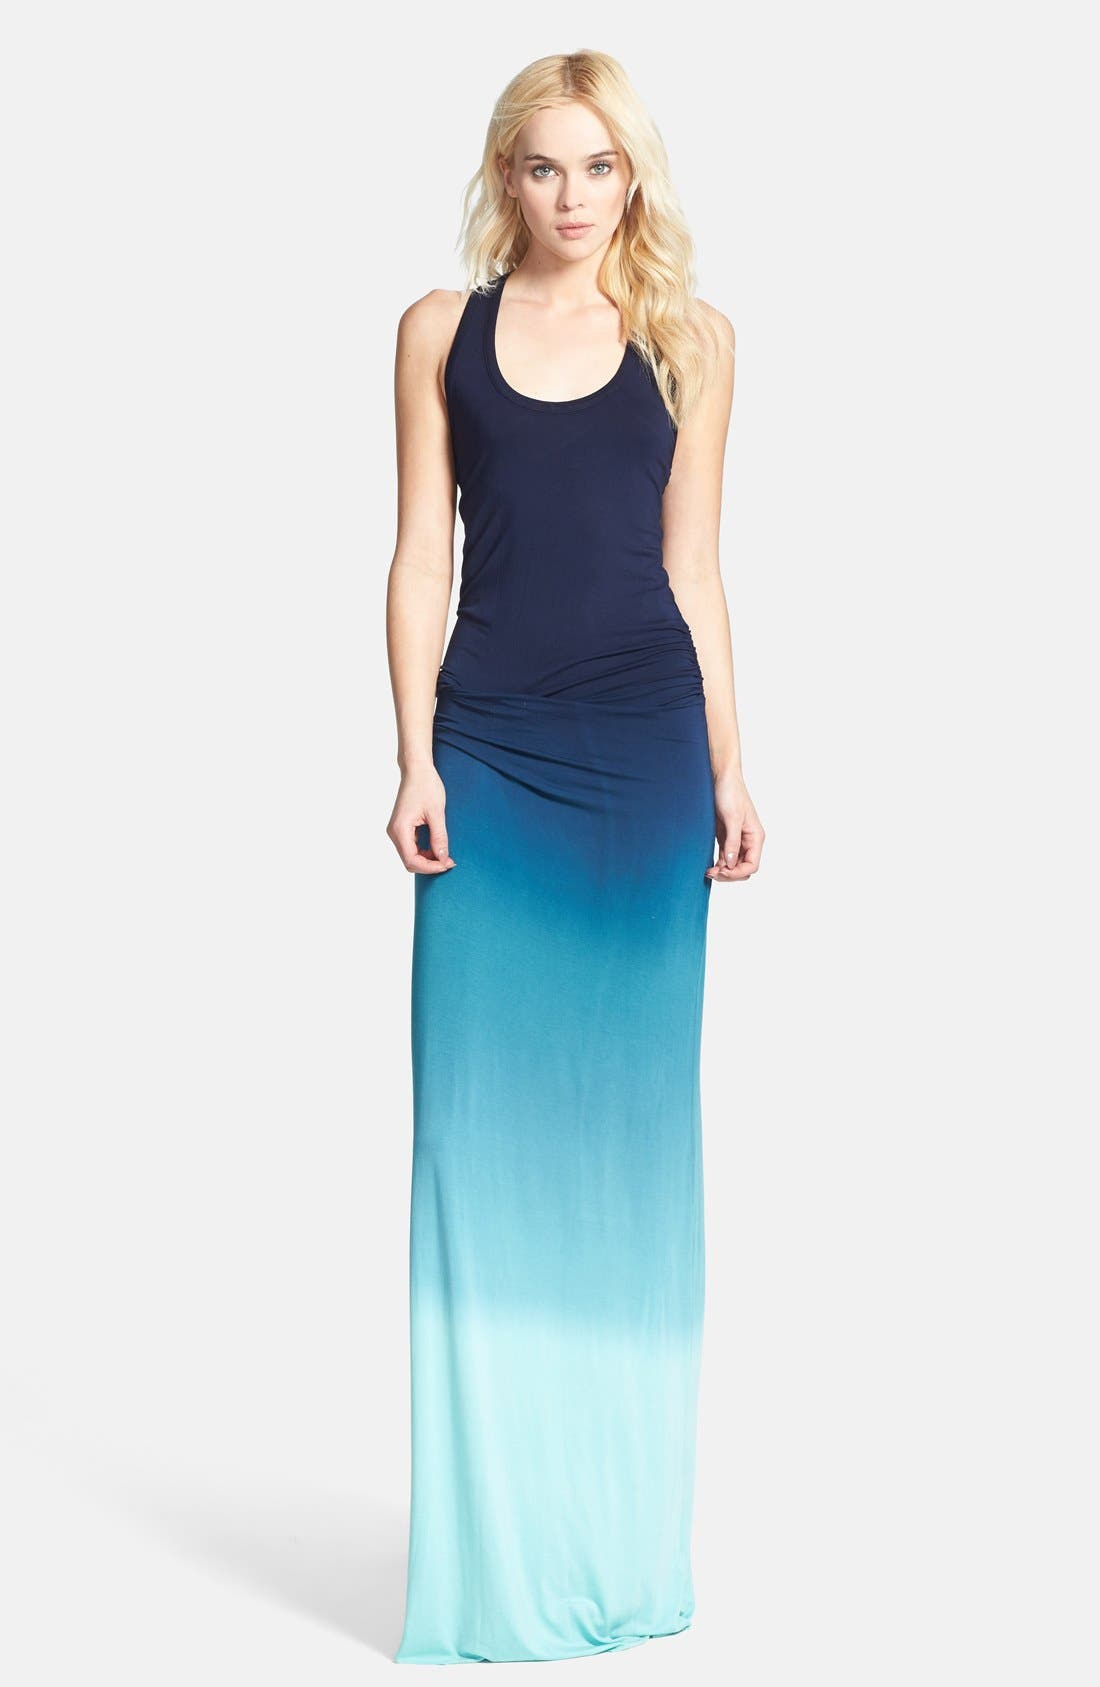 Main Image - Young, Fabulous & Broke 'Hamptons' Racerback Jersey Maxi Dress